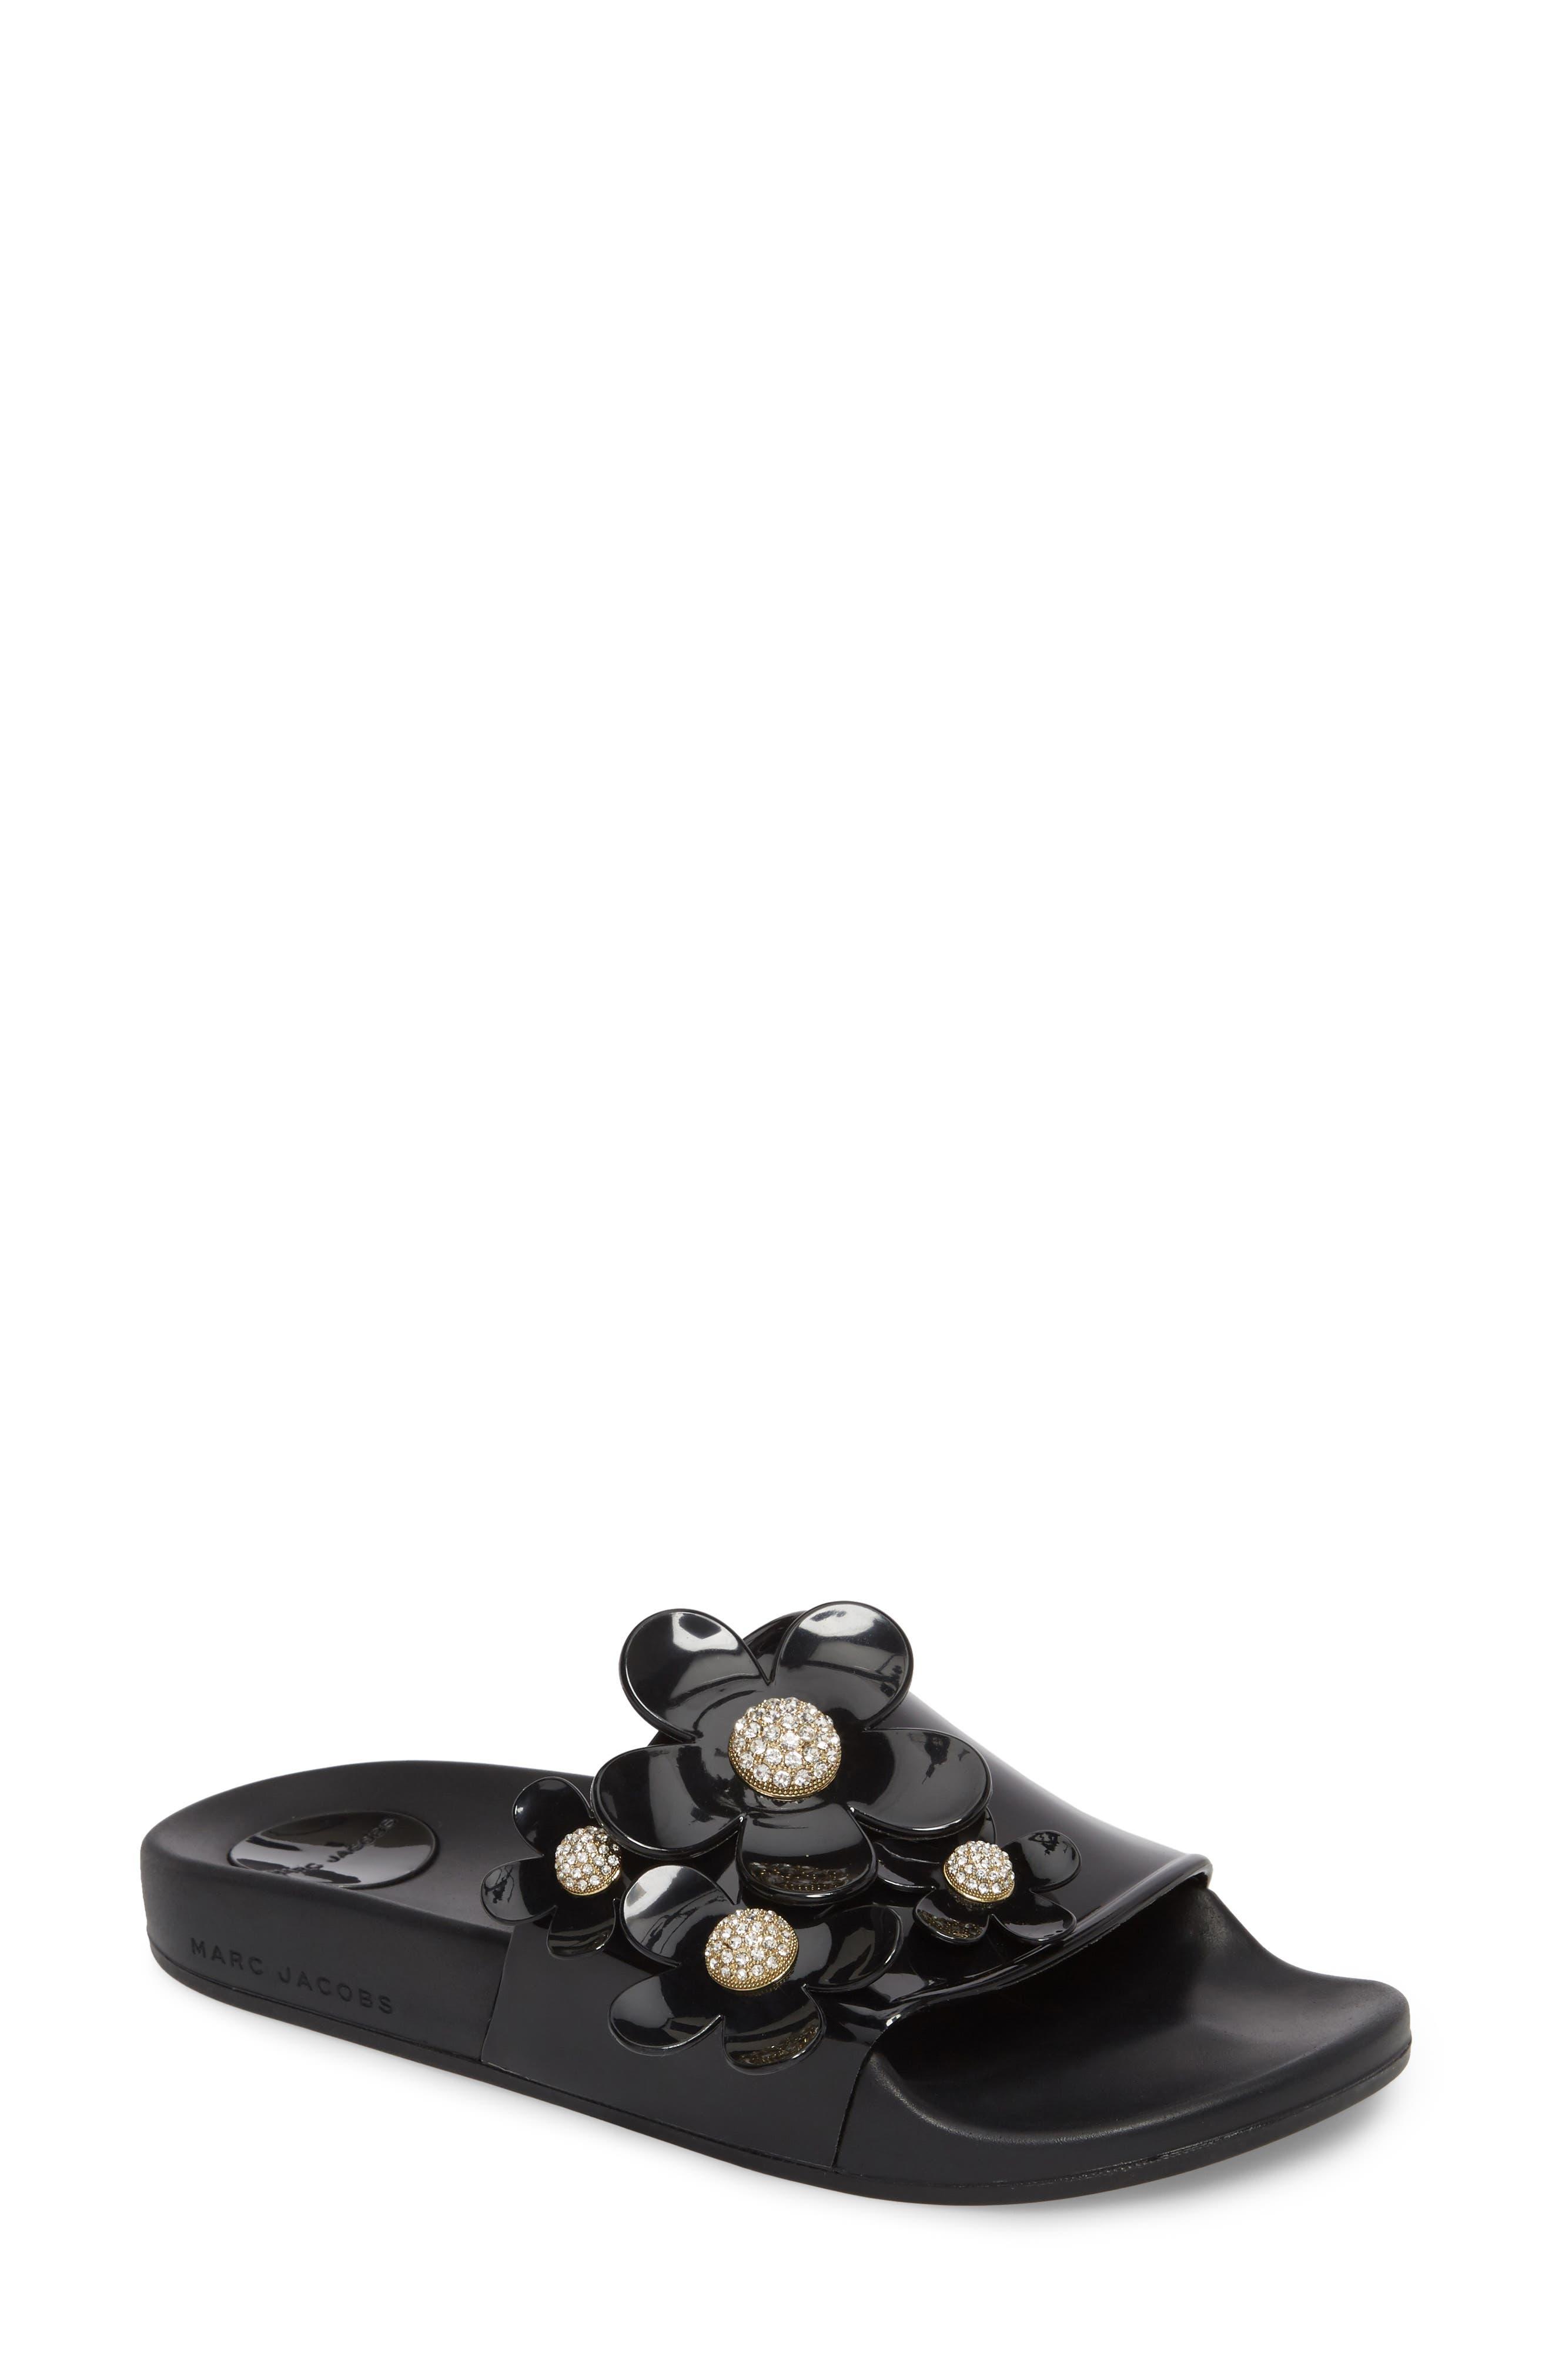 MARC JACOBS Daisy Aqua Slide Sandal (Women)